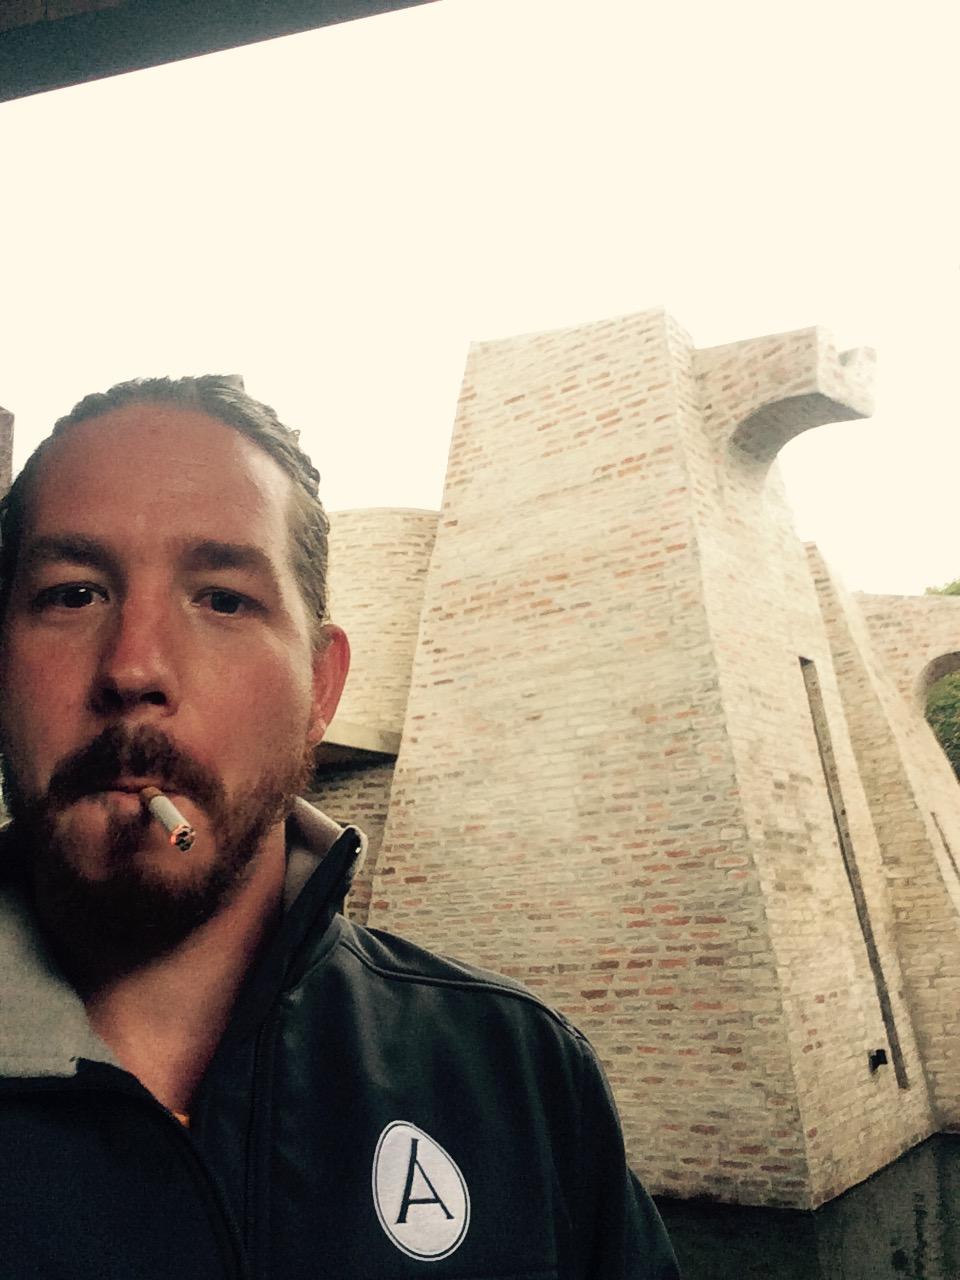 Matt the Architect